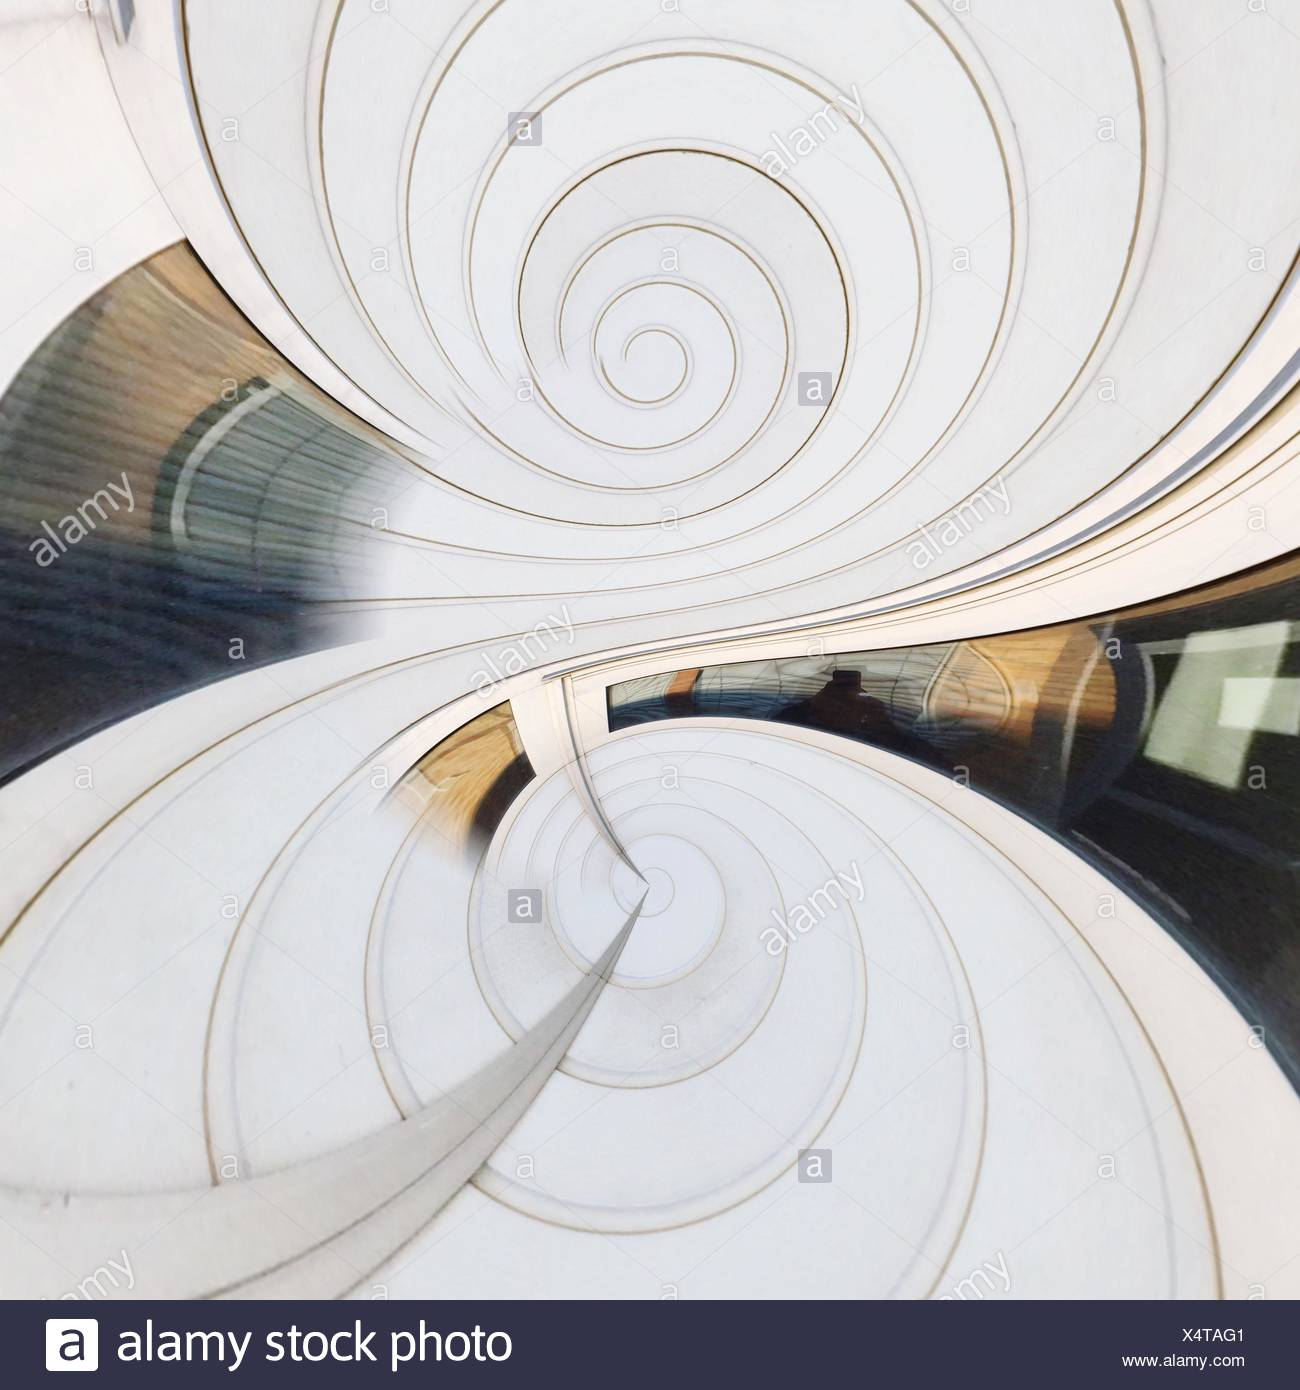 Digital Composite Image Of White Kaleidoscopic Pattern - Stock Image